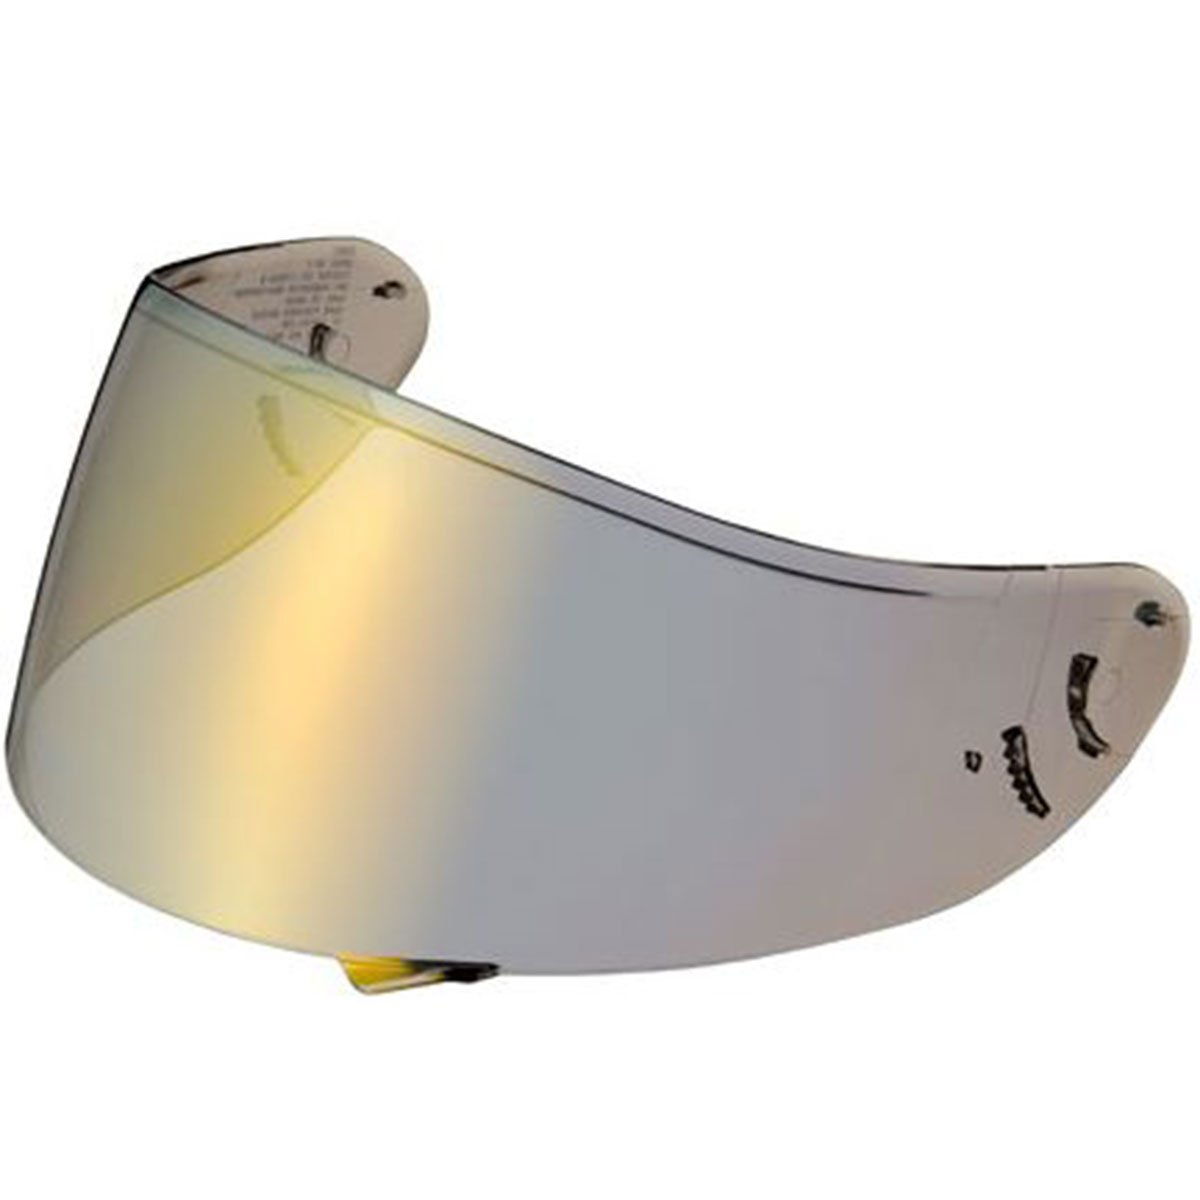 Shoei C-W1 Pinlock Shield Helmet Accessories - Gold One Size